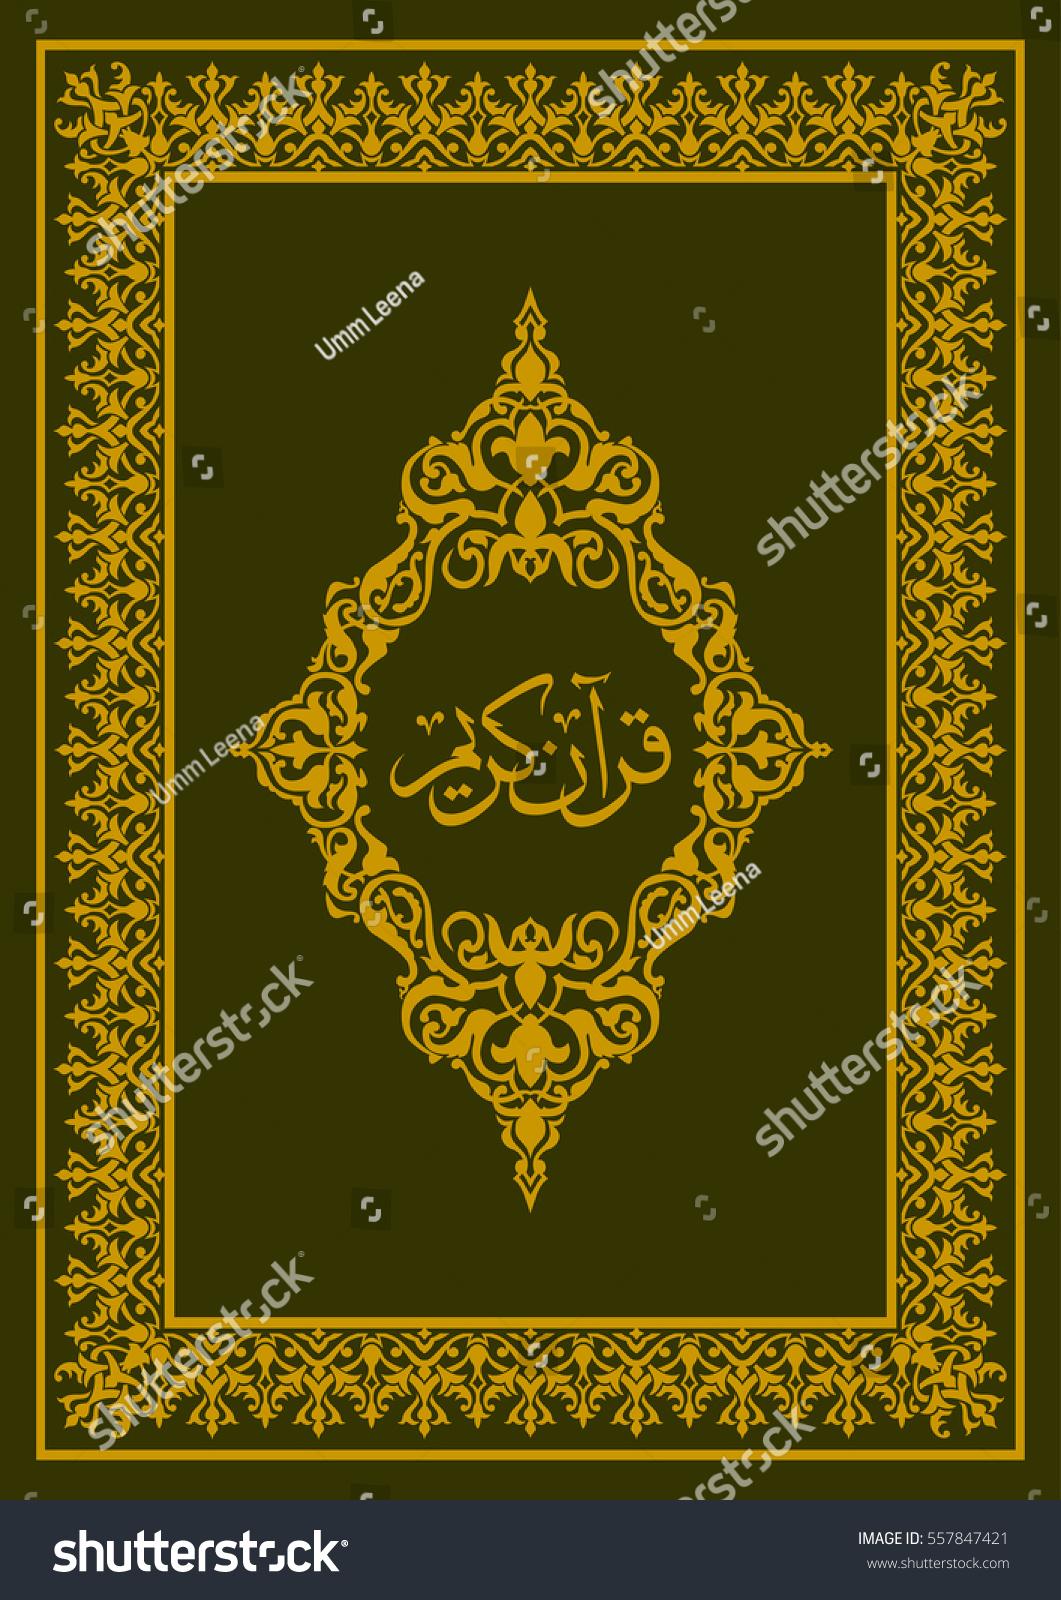 Quran Book Cover Template : Holy quran islamic arabic book arabesque stock vector